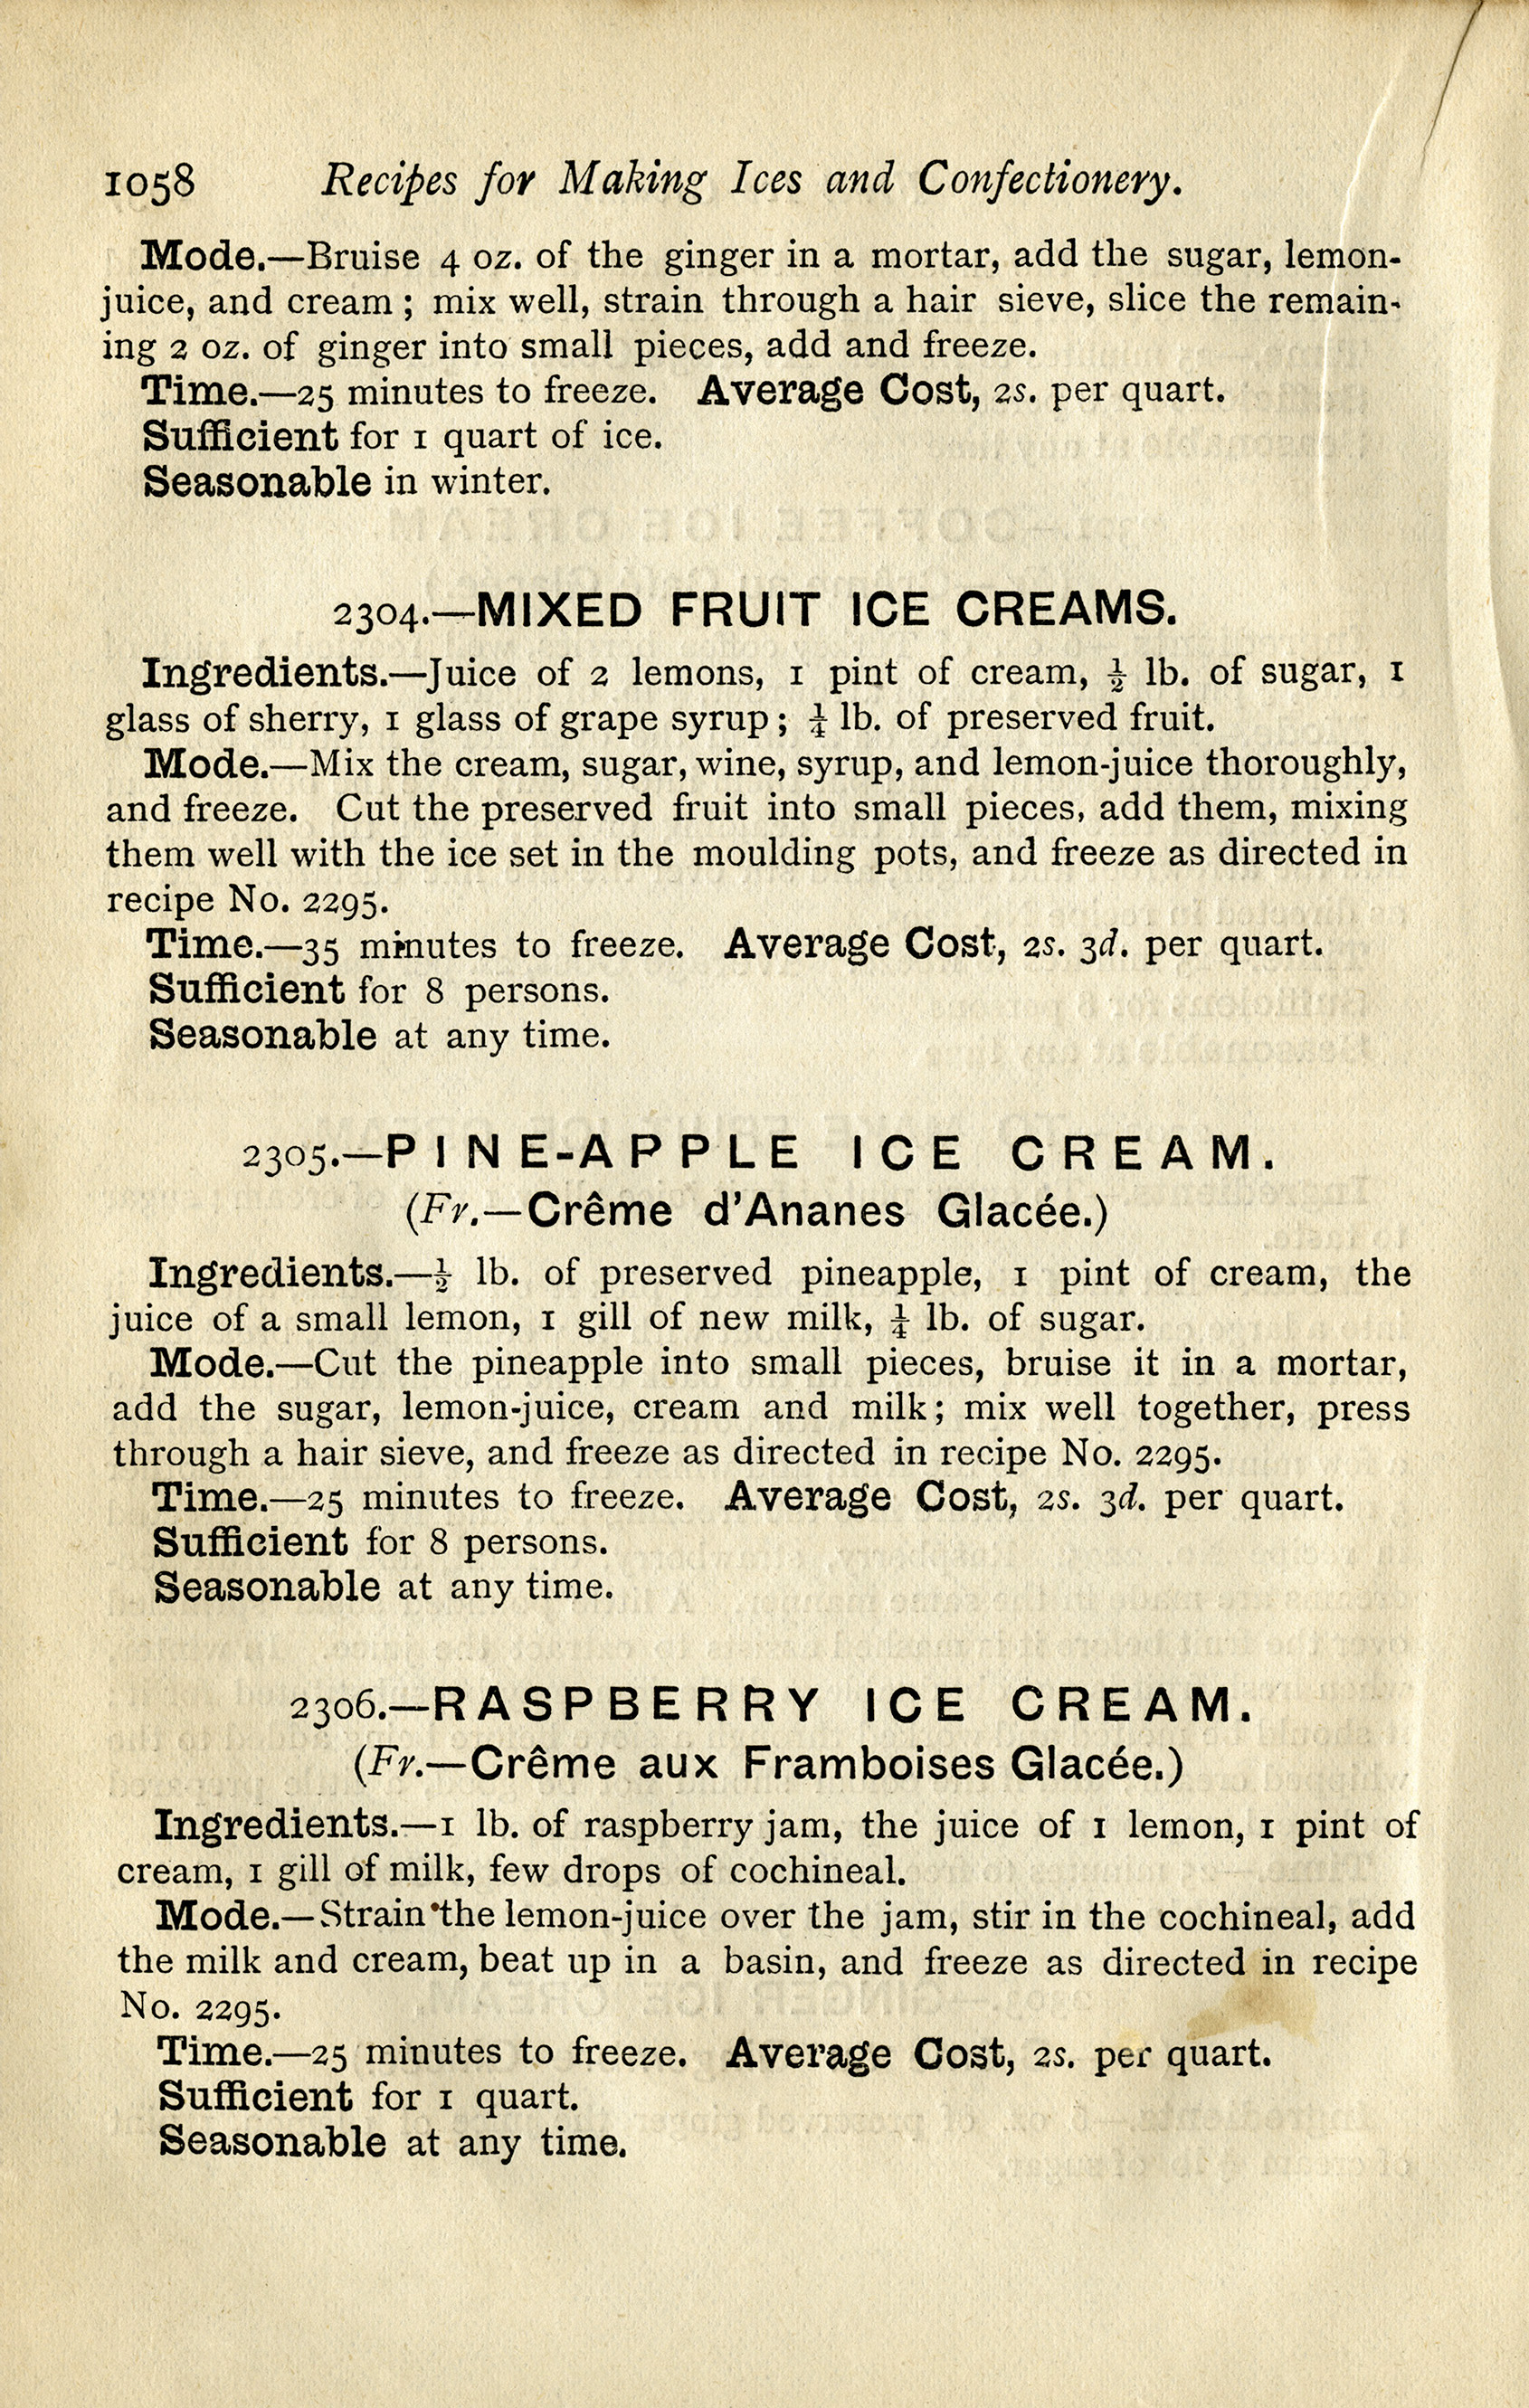 Vintage Ice Cream Recipes  Free Digital Graphics  Old